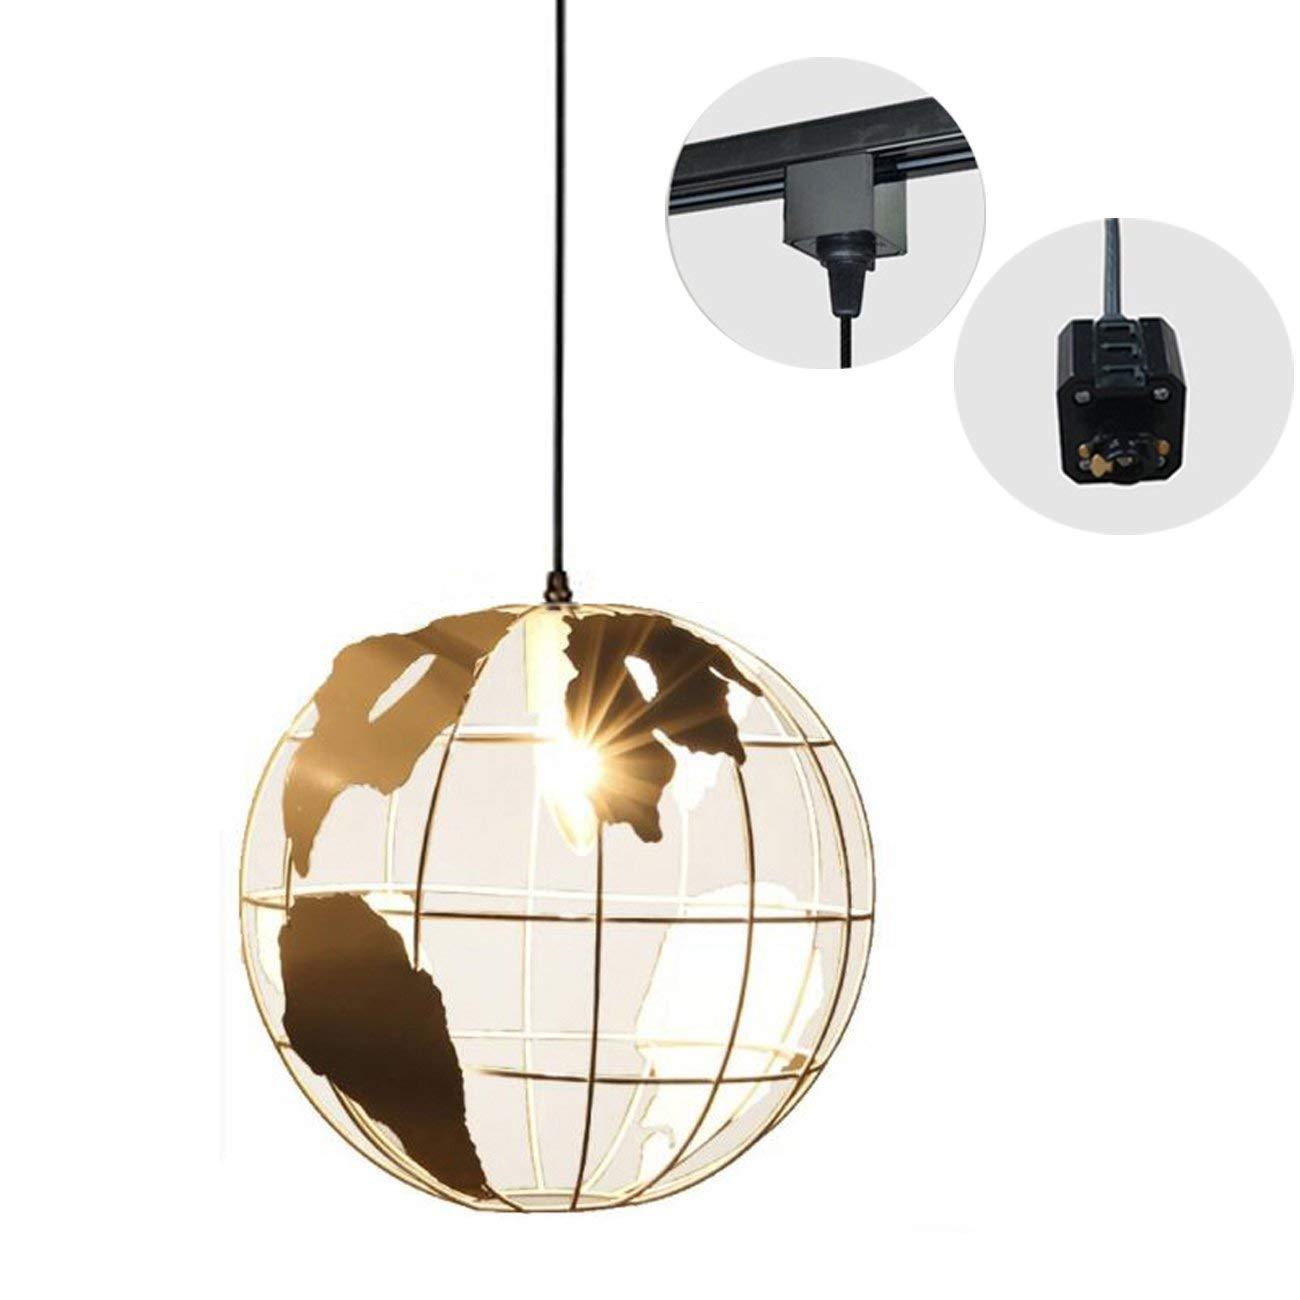 H-Type 3 Wire Metal Globe Track Light Pendants Length 1.5m Restaurant Chandelier Deco Chandelier Instant Pendant Fixture,Bulb Not Include, Industrial 1 Light Pendant Lamp (TB0268-B)